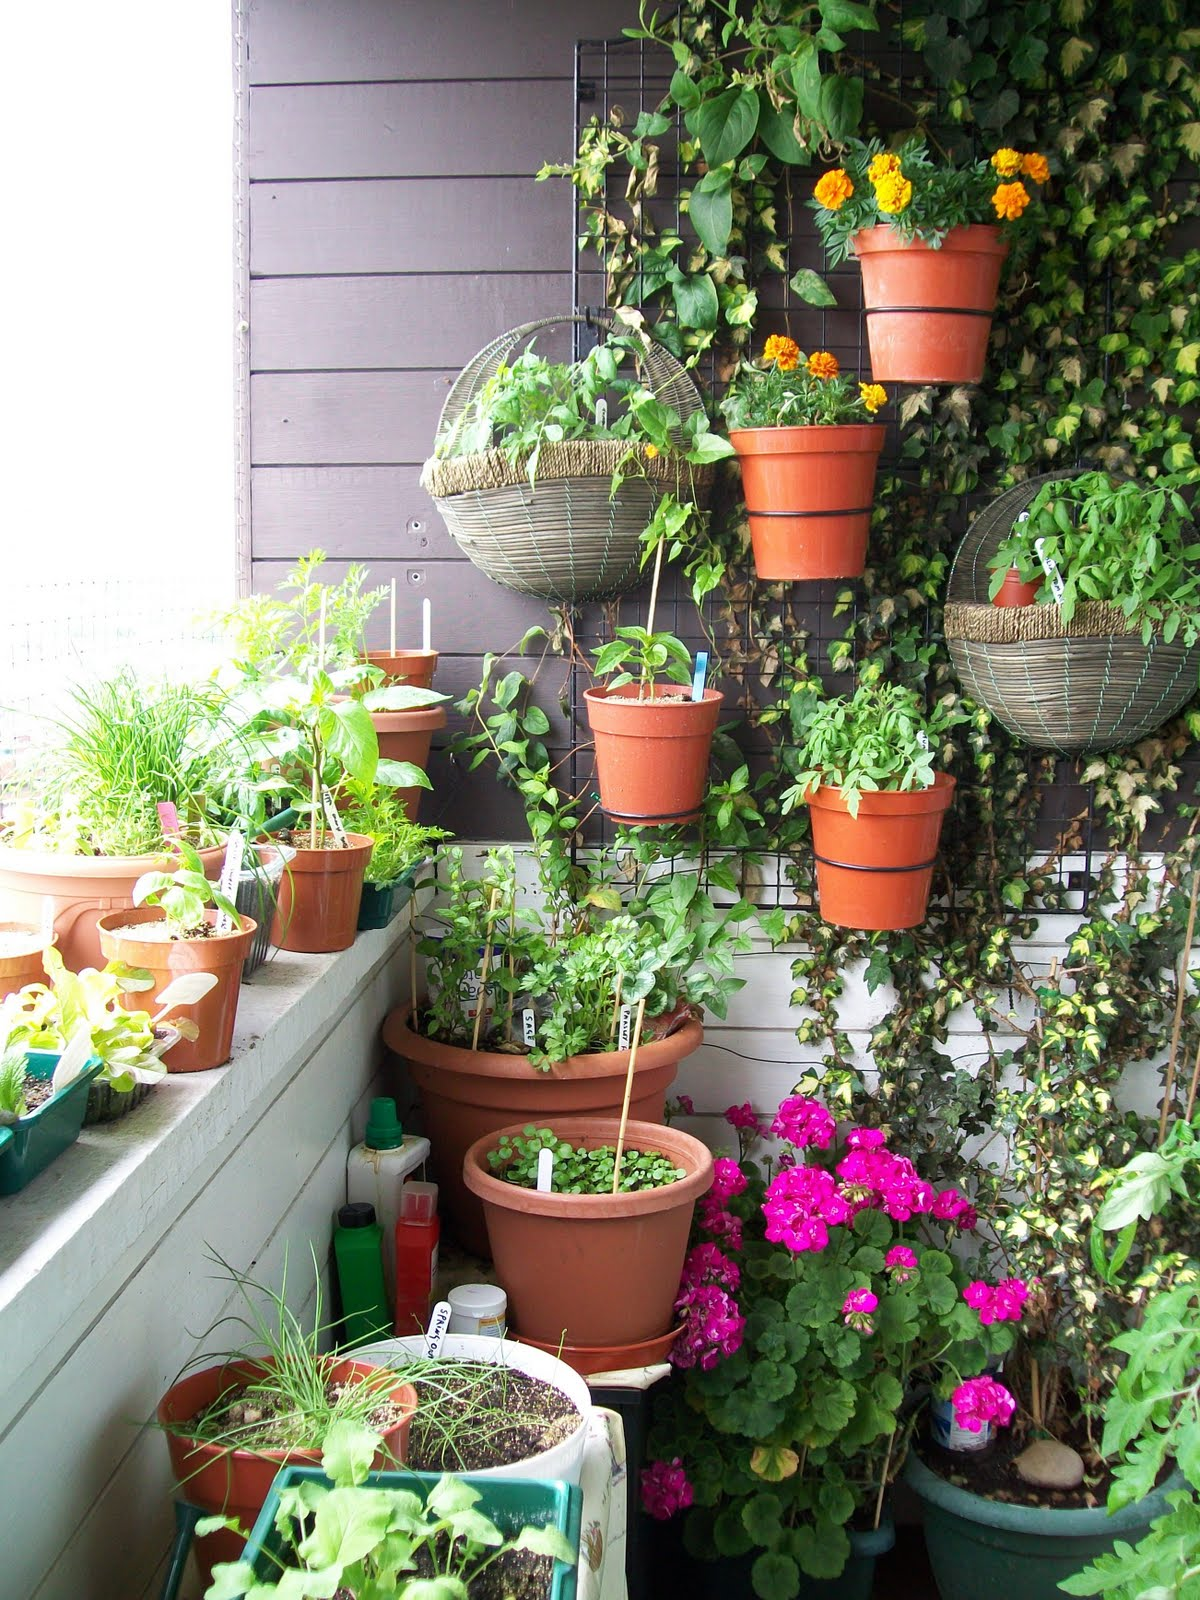 Balcony Gardening Balcony Gardening Kevinthegarden's Blog 25